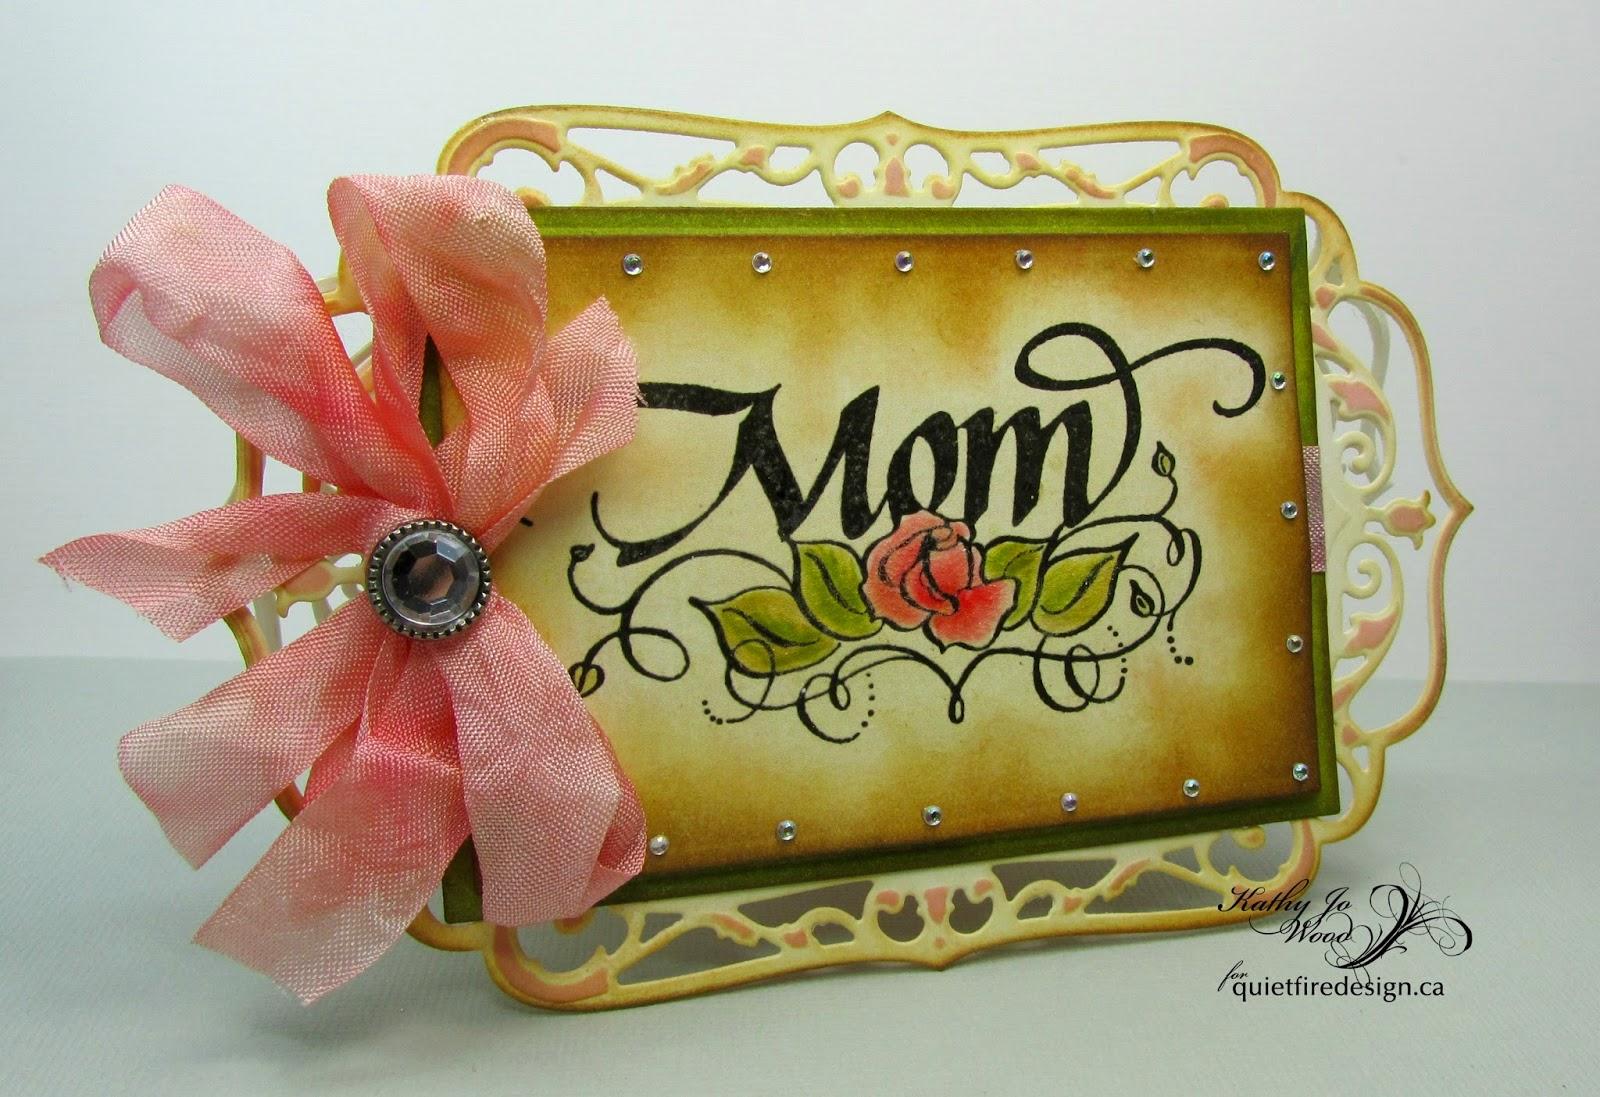 Quietfire, Mom Floral Ornament, Keep Calm & Call Mom, Spellbinders, Kathy Jo Wood, shaped card